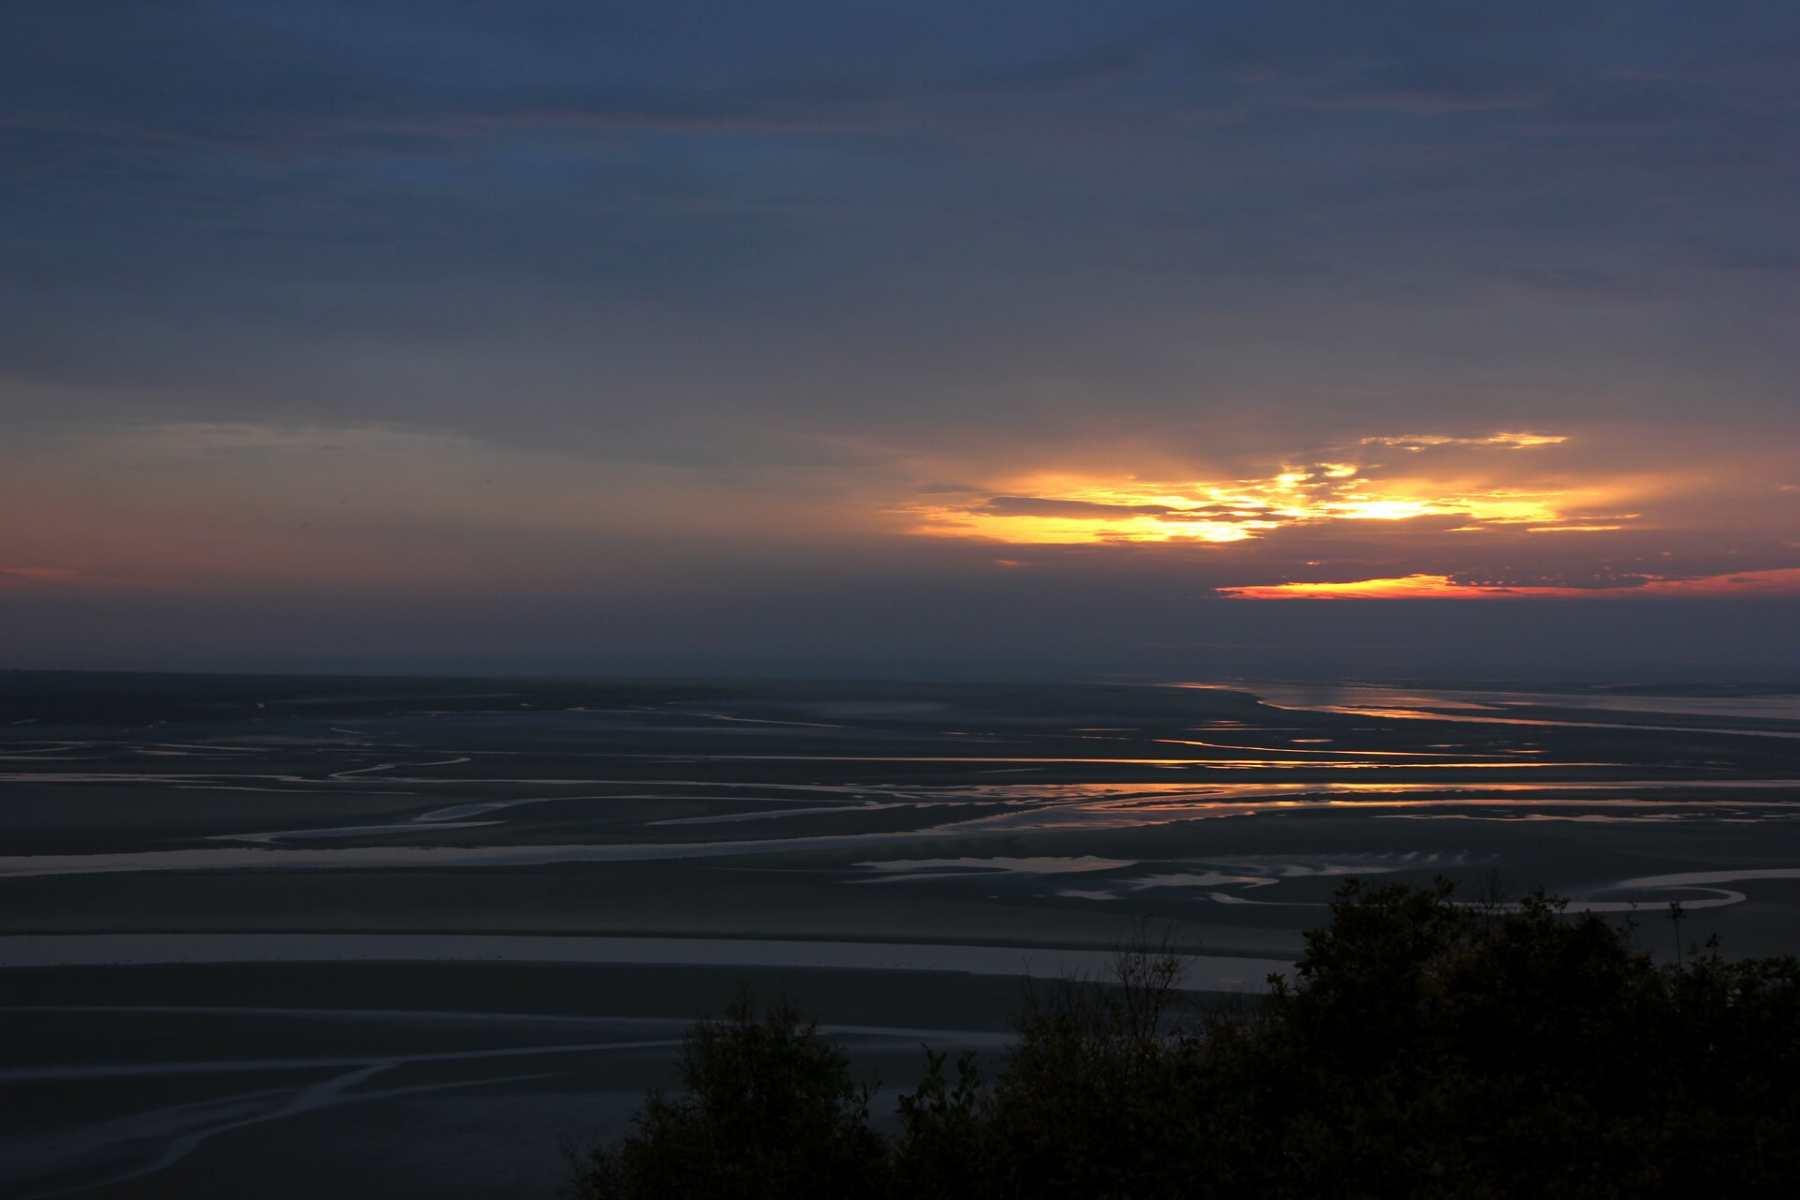 sunset-over-portmeirion-estuary-2